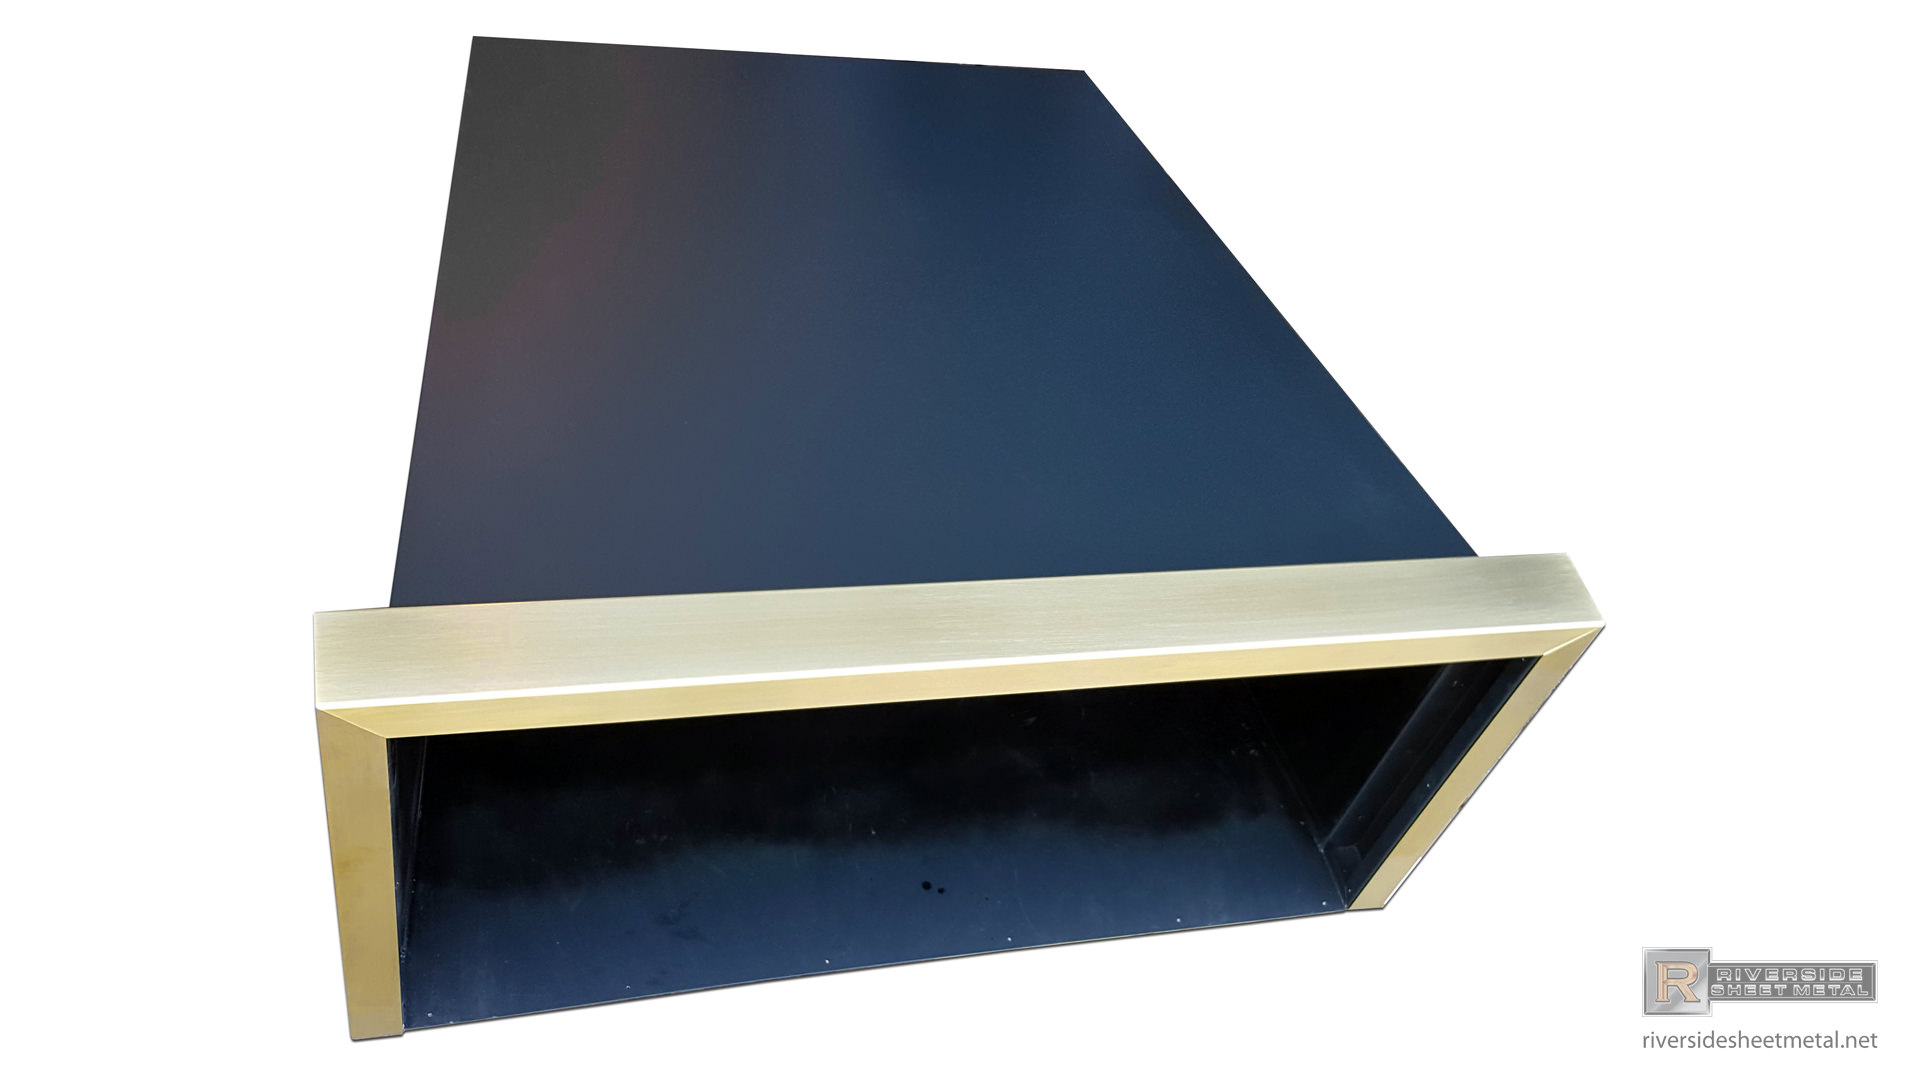 Hood Vents Range Hoods Copper Stainless Steel And Zinc